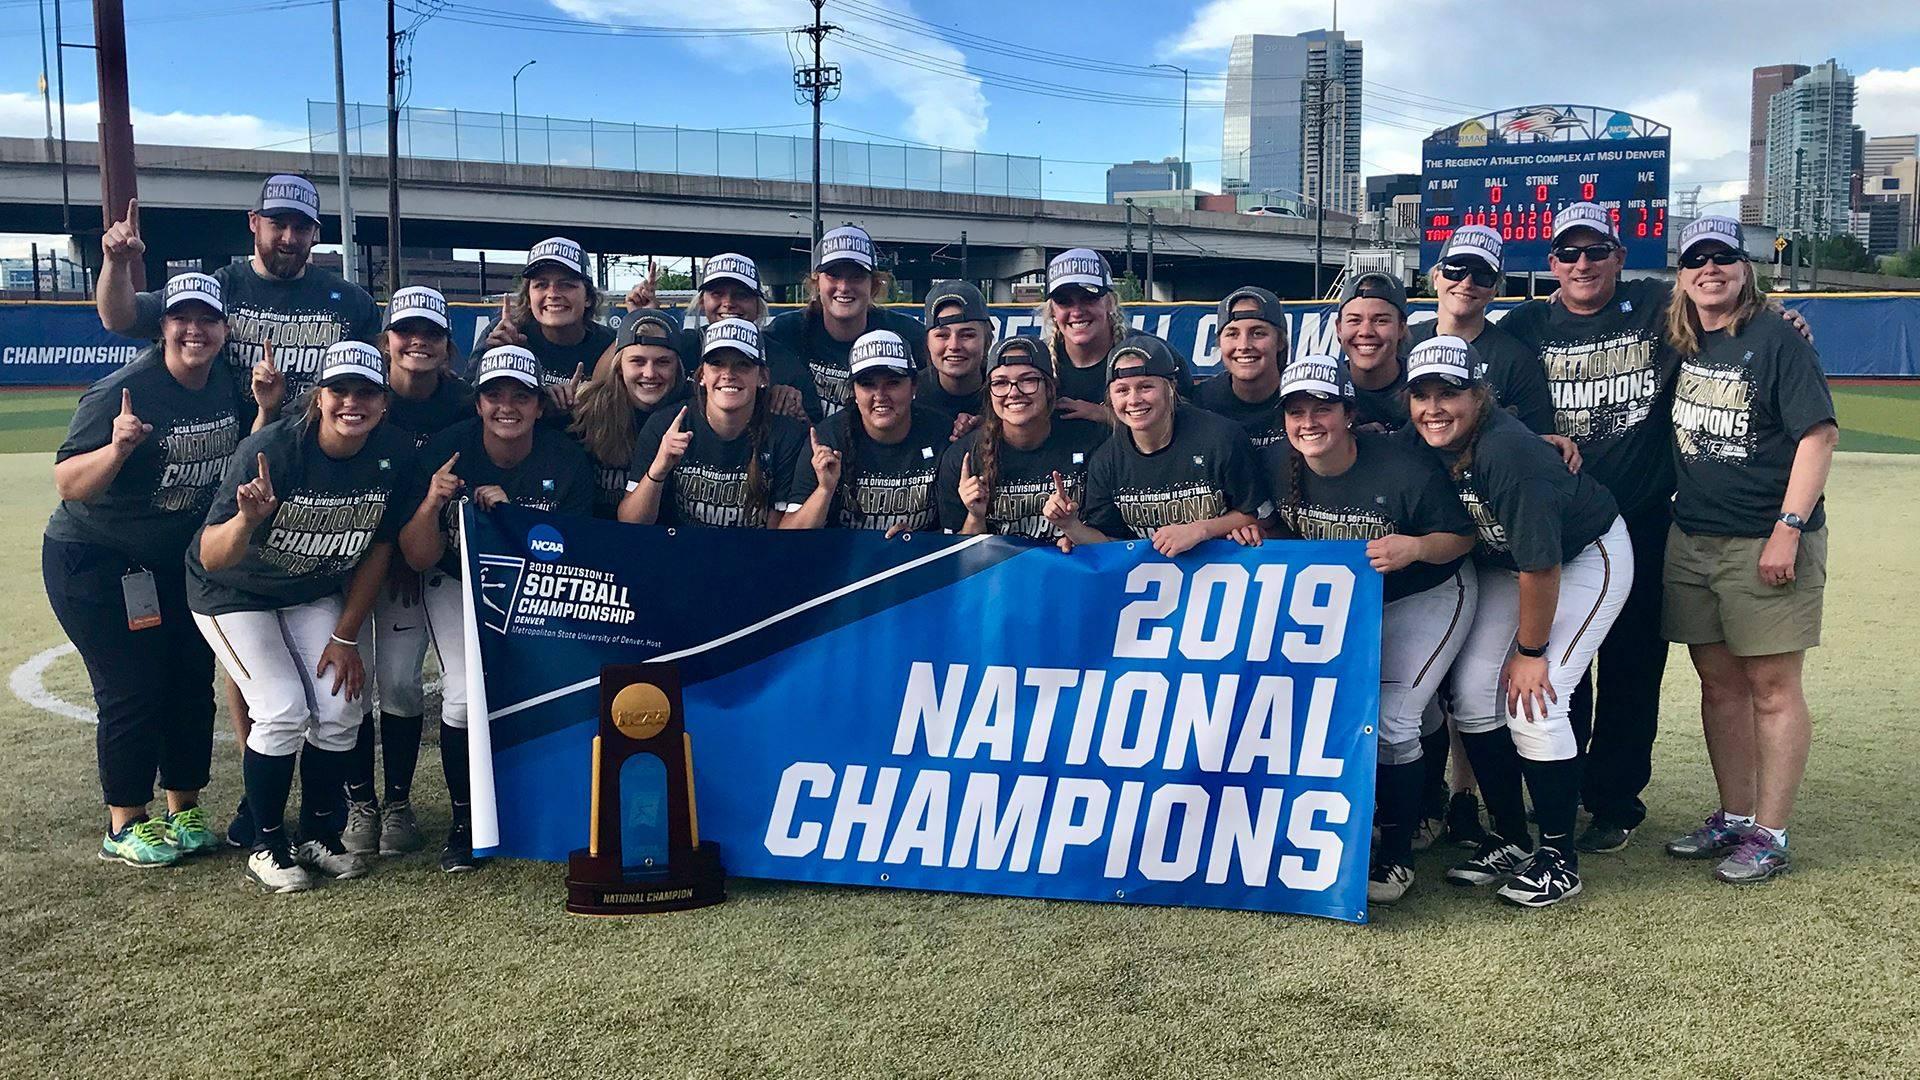 Augustana University National Softball Champions